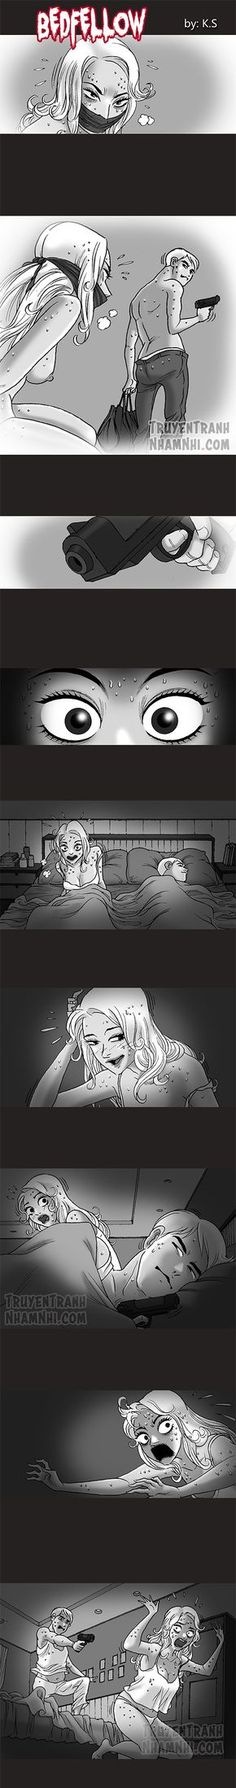 Chapter 223 Bedwellow (A) Creepy Games, Creepy Art, Creepy Stories, Horror Stories, Silent Horror Comics, Creepy Comics, Scary Images, 4 Panel Life, Dark Comics